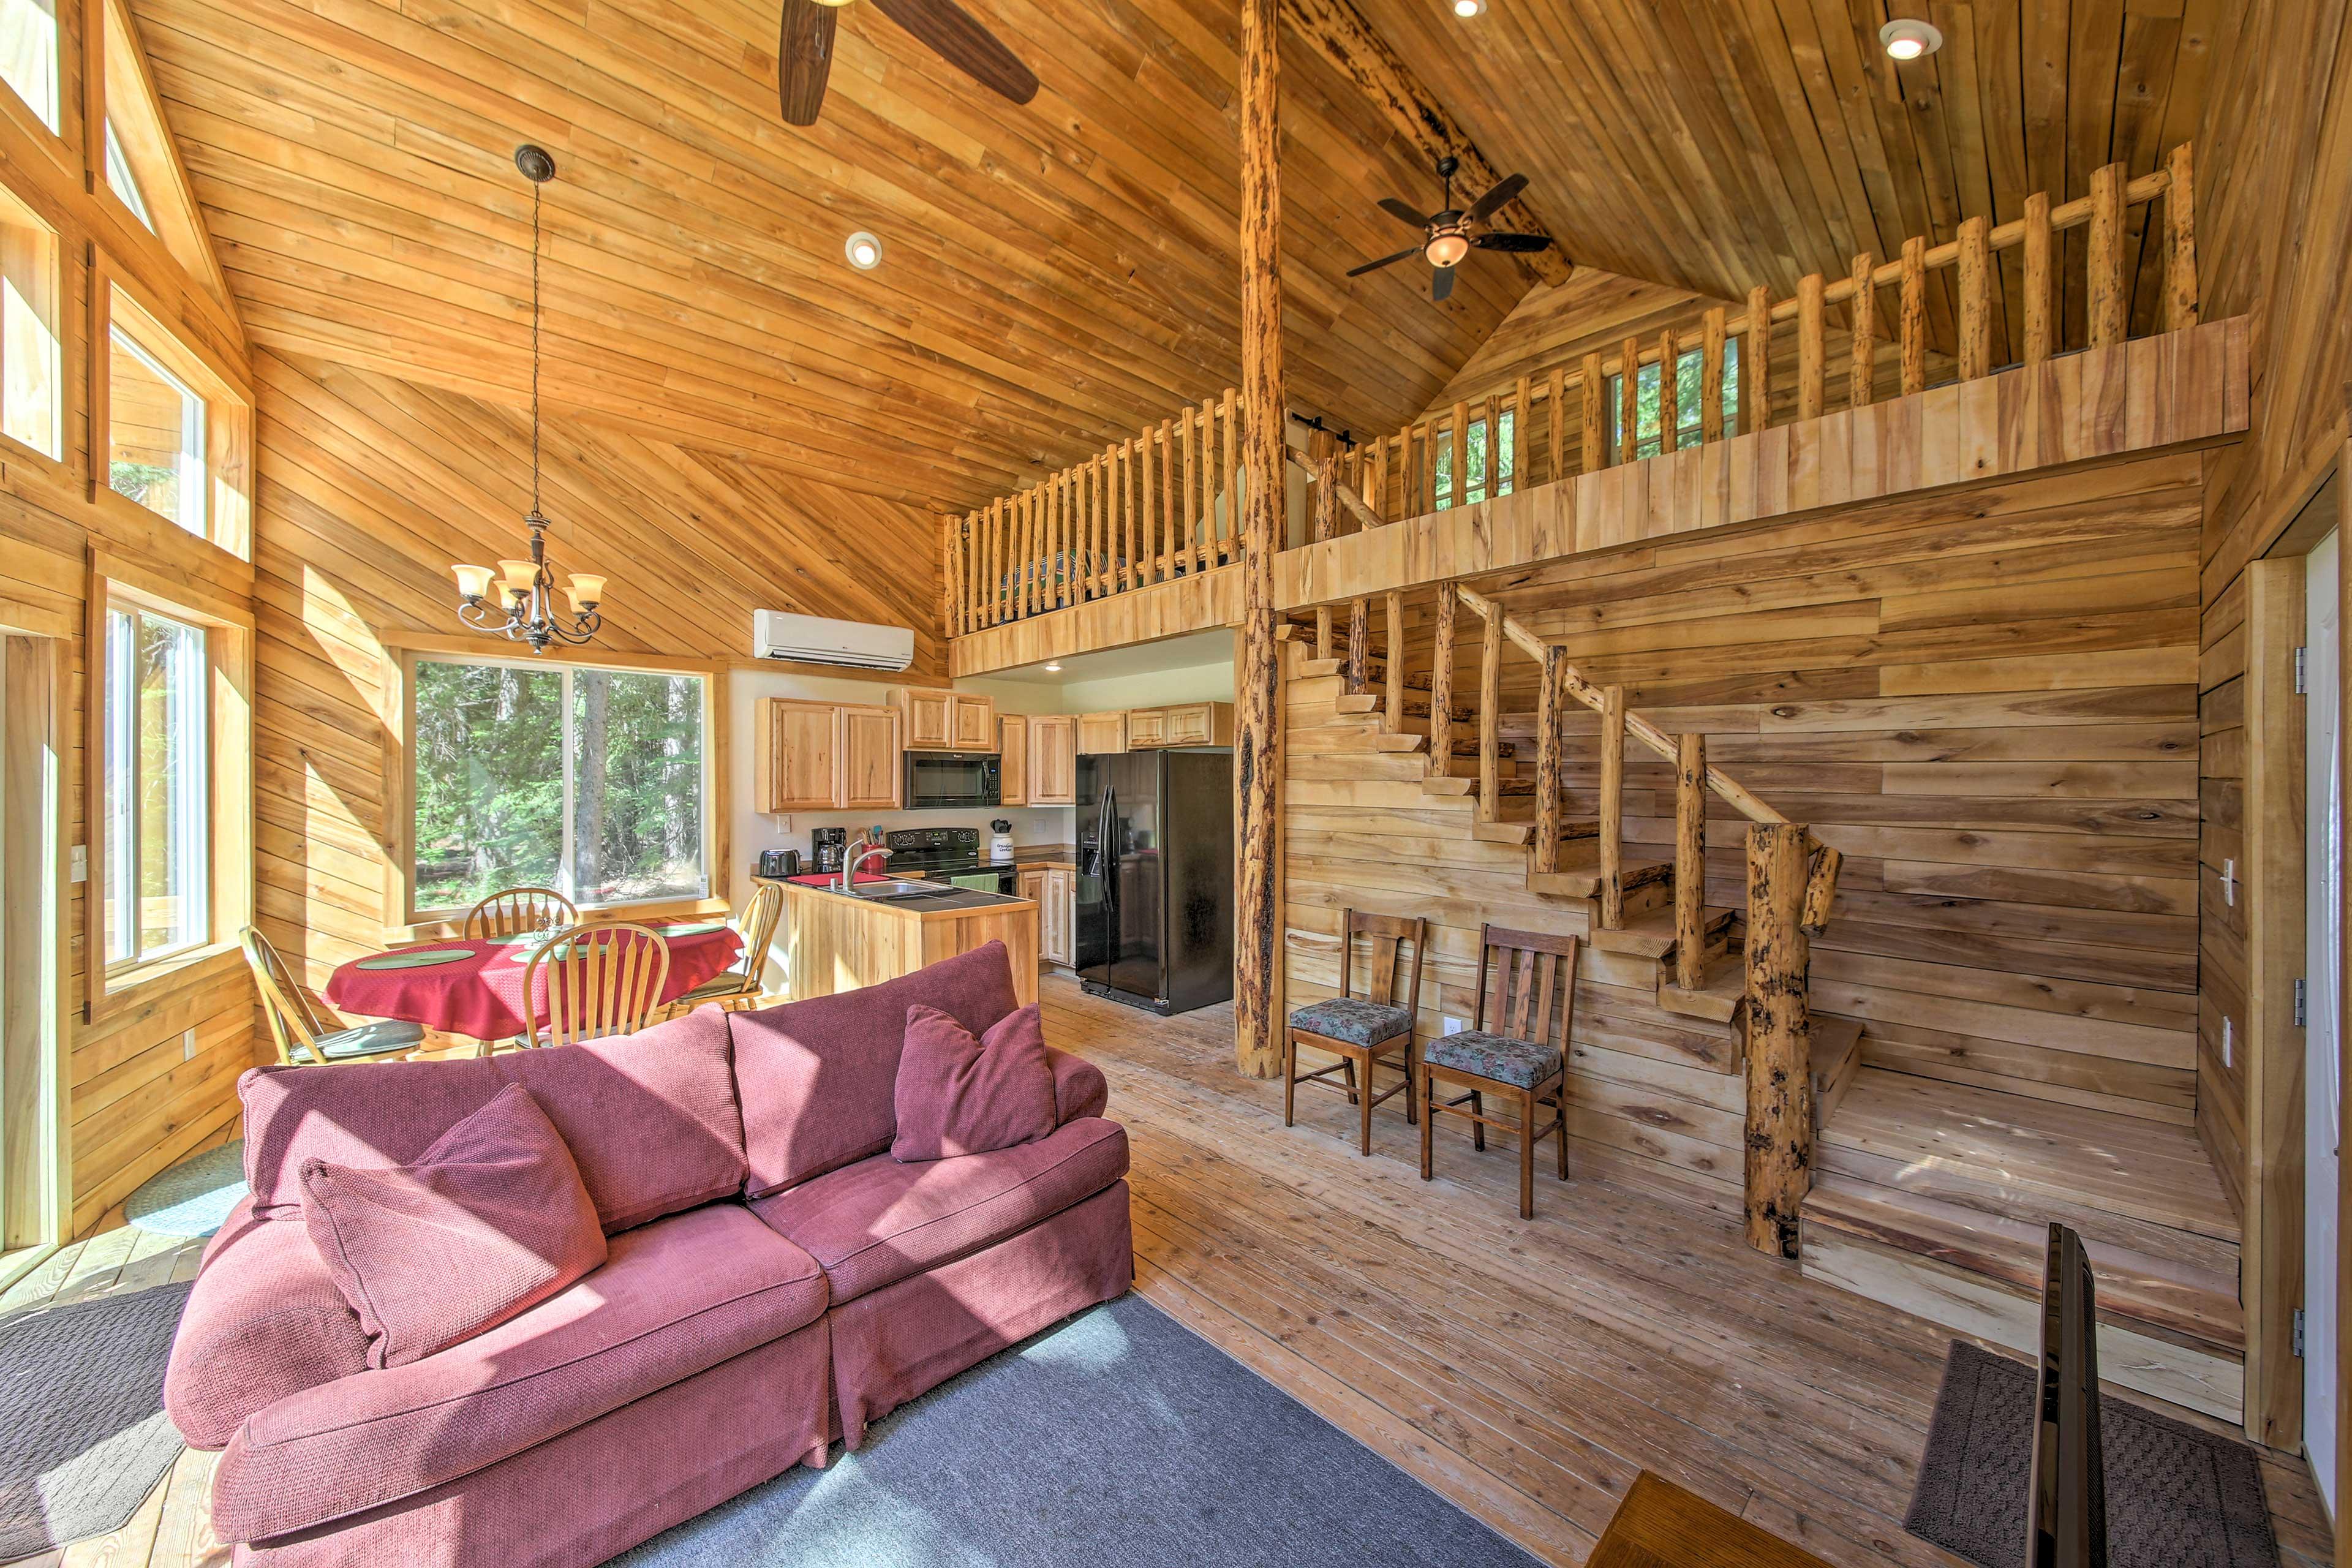 Custom woodwork enhances the log cabin experience.